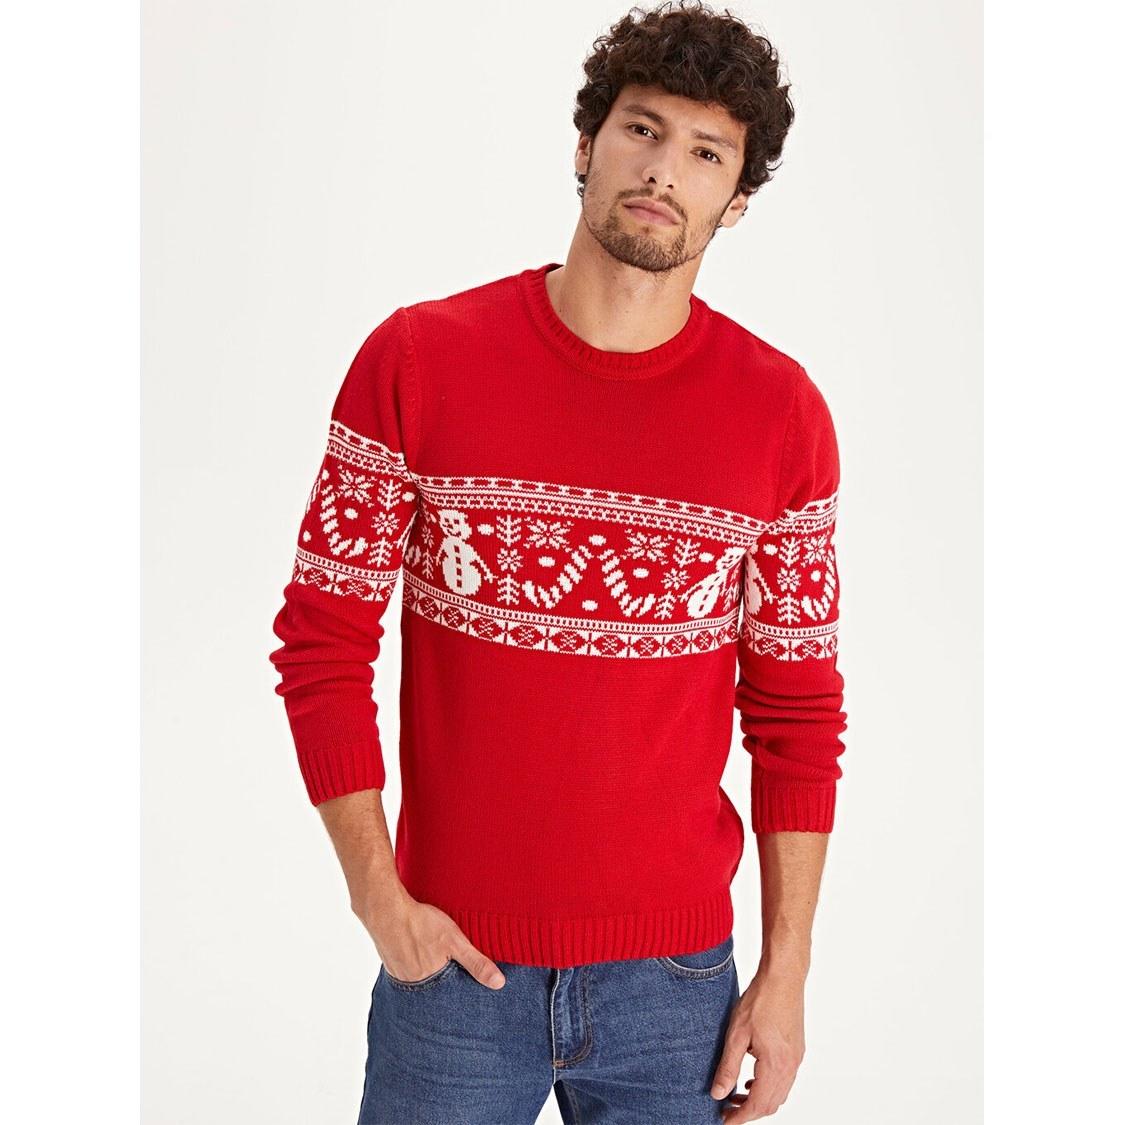 تصویر پلیور طرح کریسمس مردانه ال سی وایکیکی کد 55351